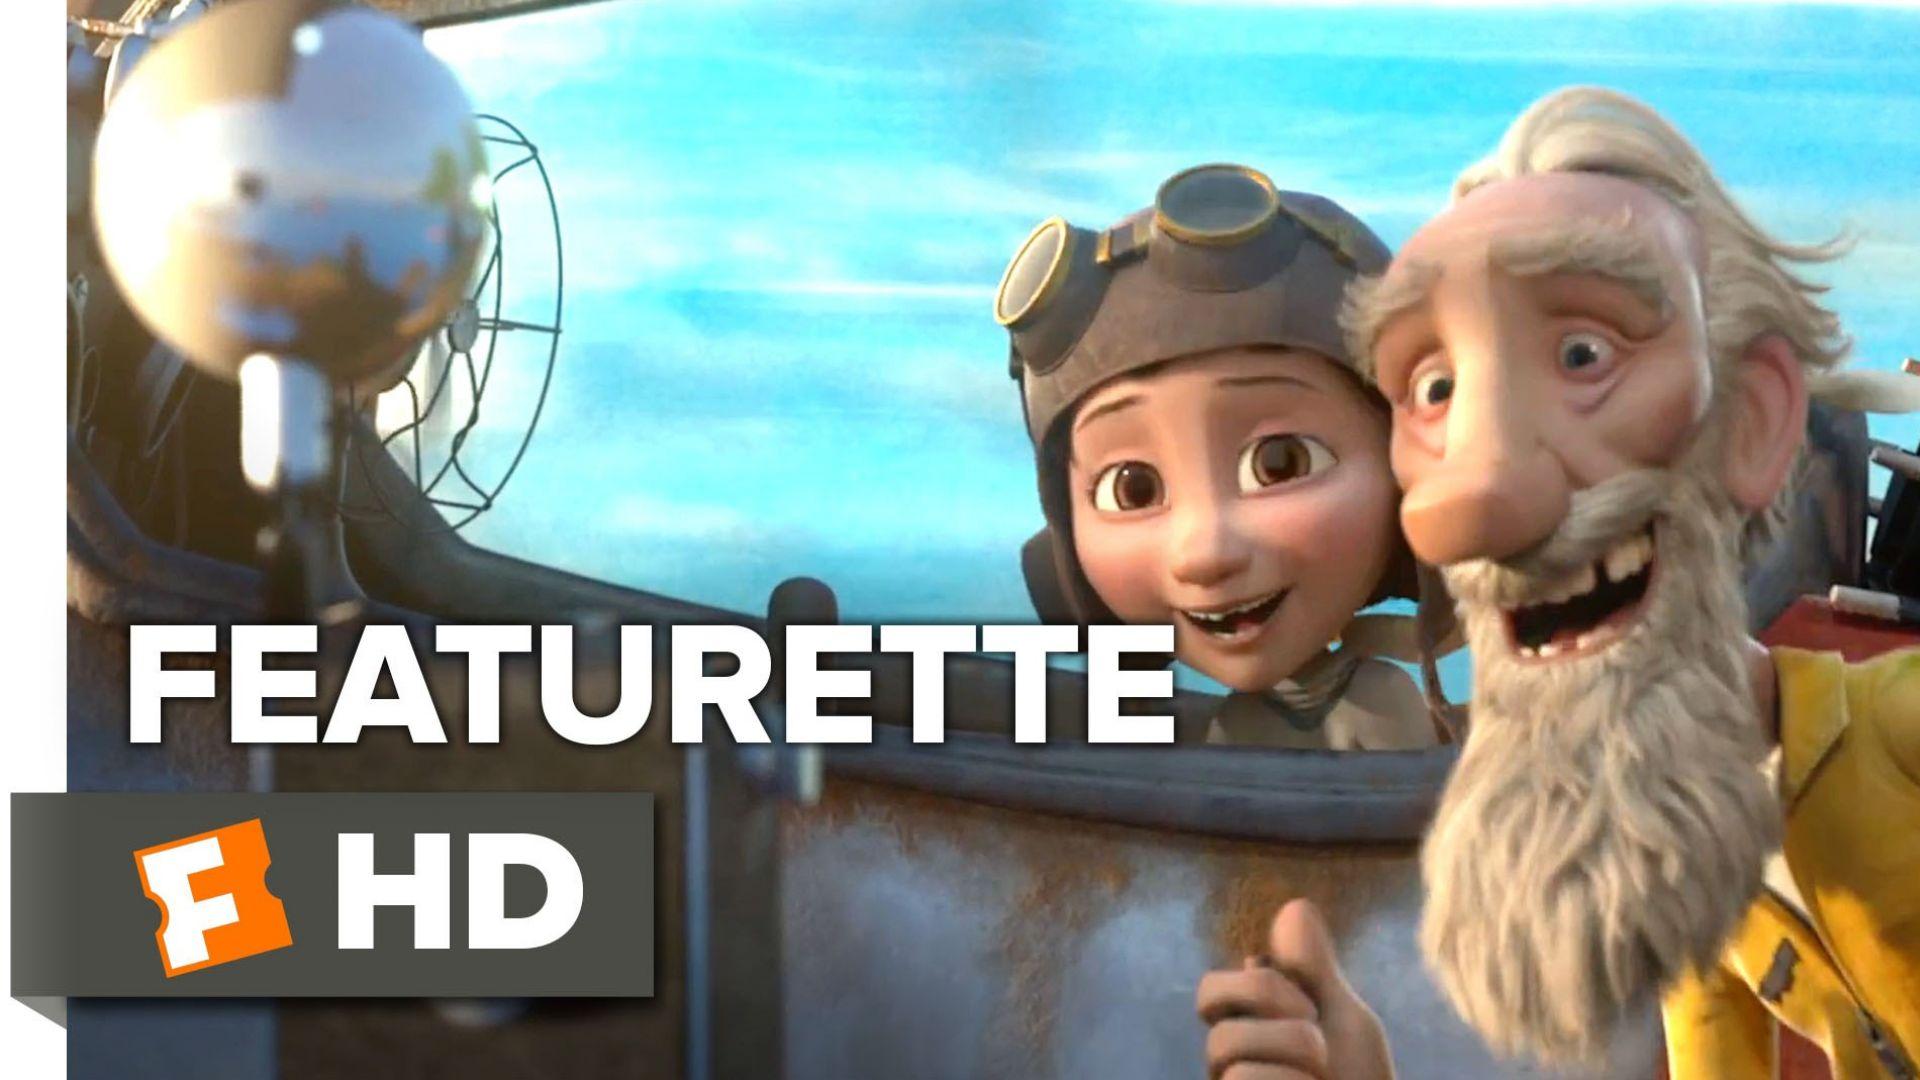 The Little Prince - Featurette Behind The Scenes Jeff Bridge